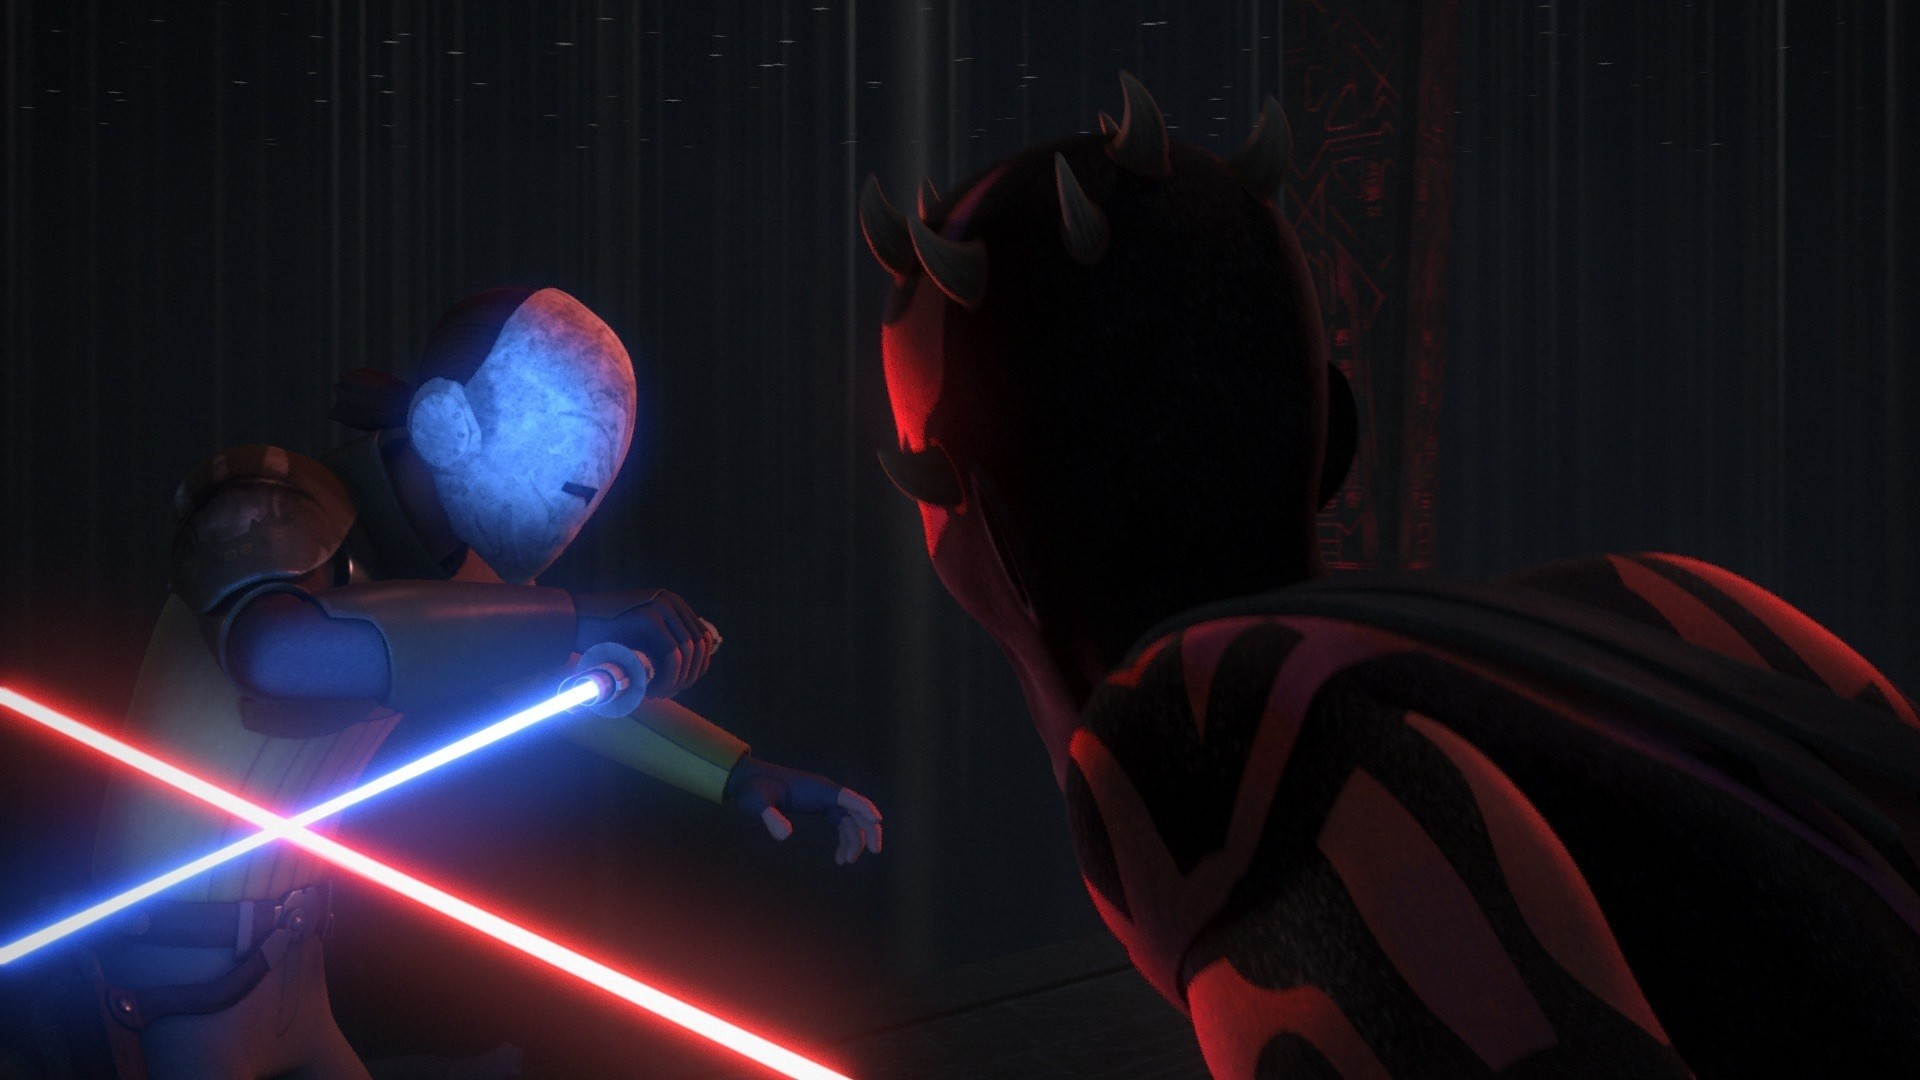 Star Wars Rebels – Kanan vs. Maul